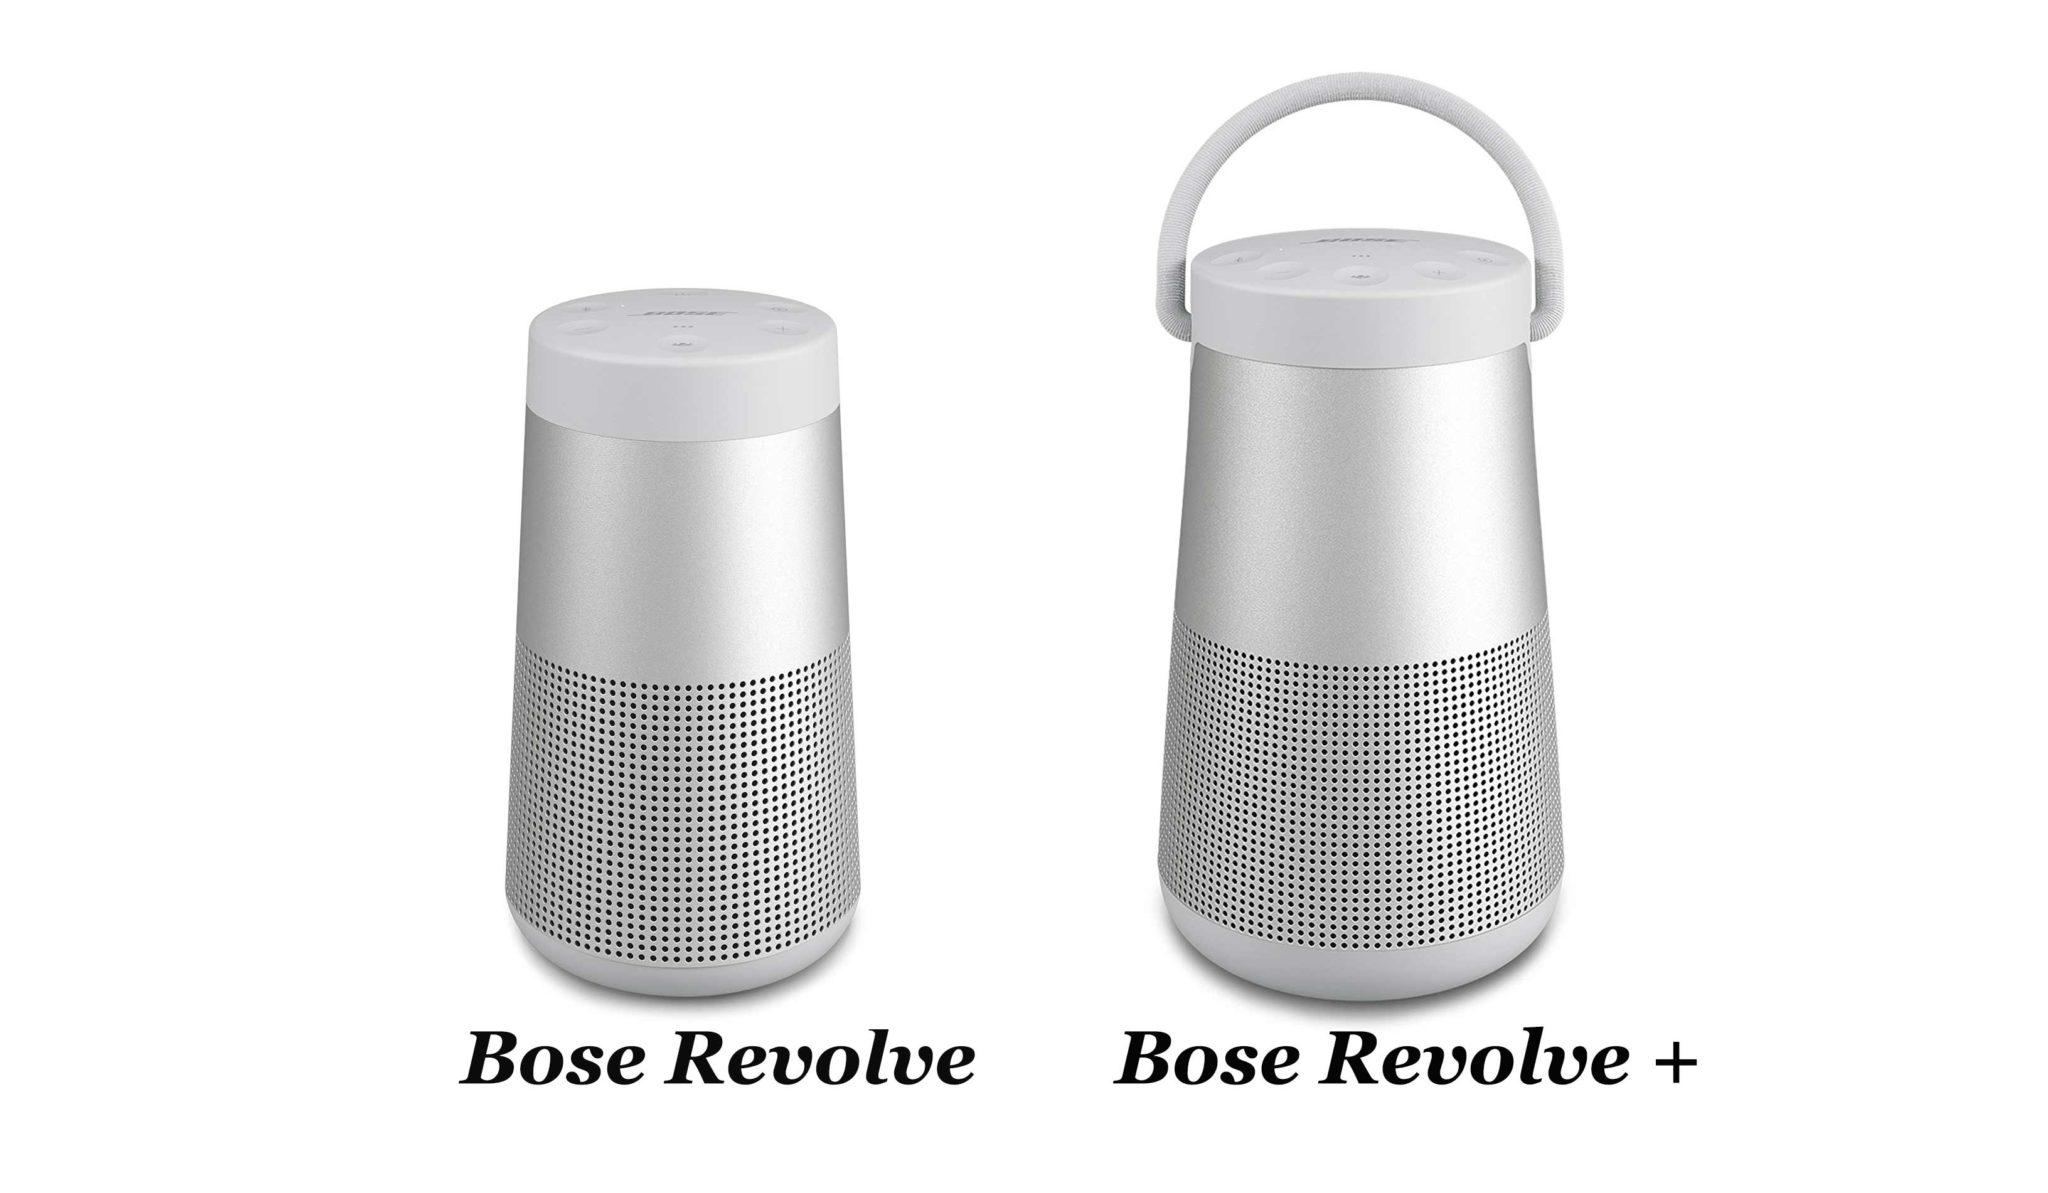 Bose-Revolve-vergleich